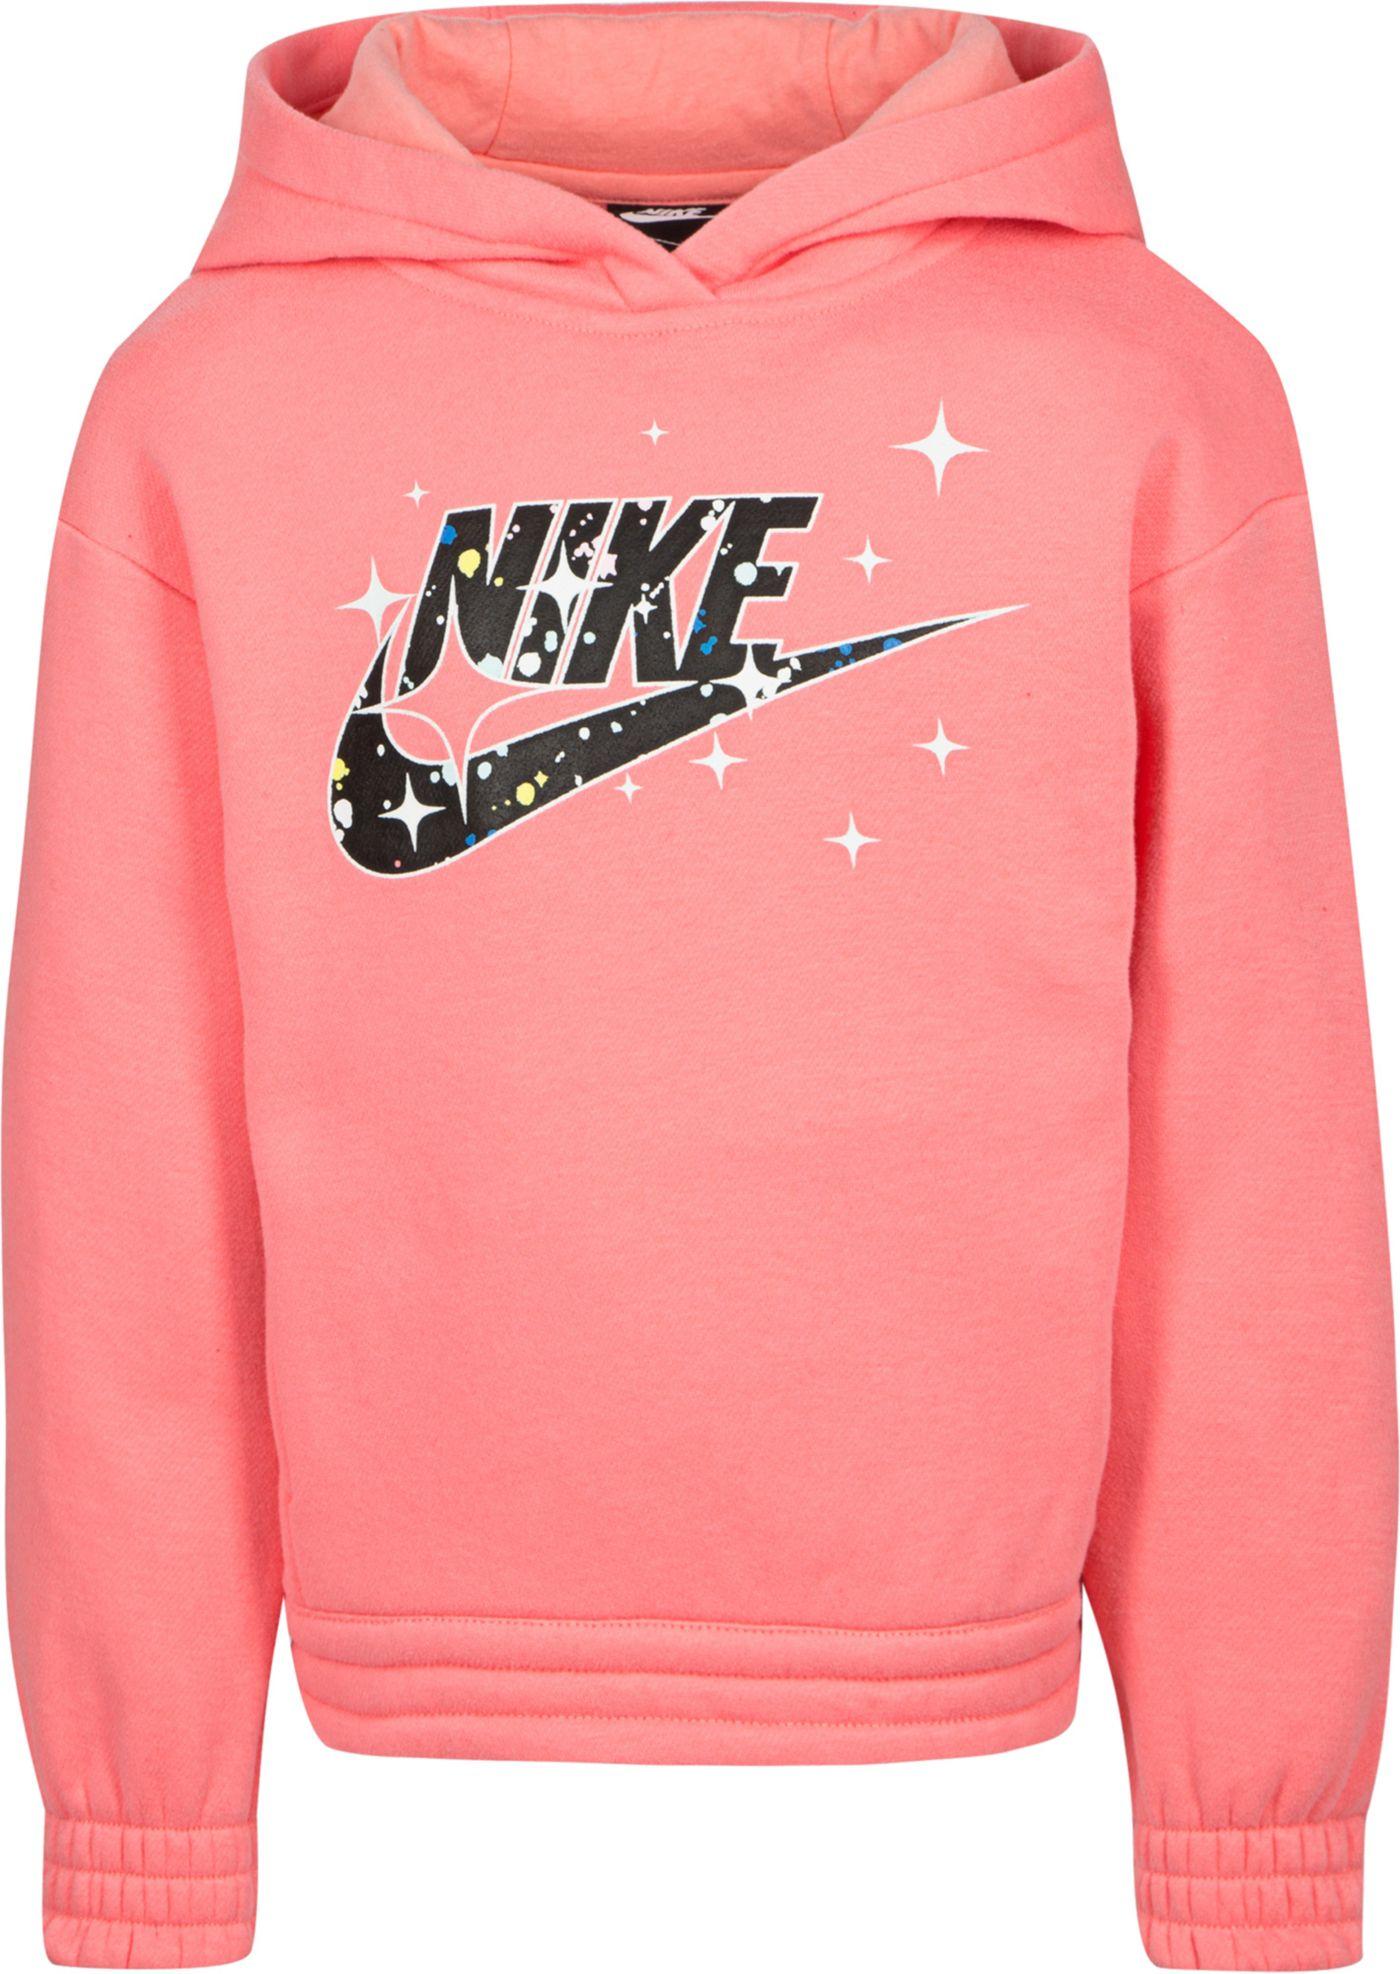 Nike Little Girls' Lightweight Fleece Graphic Hoodie